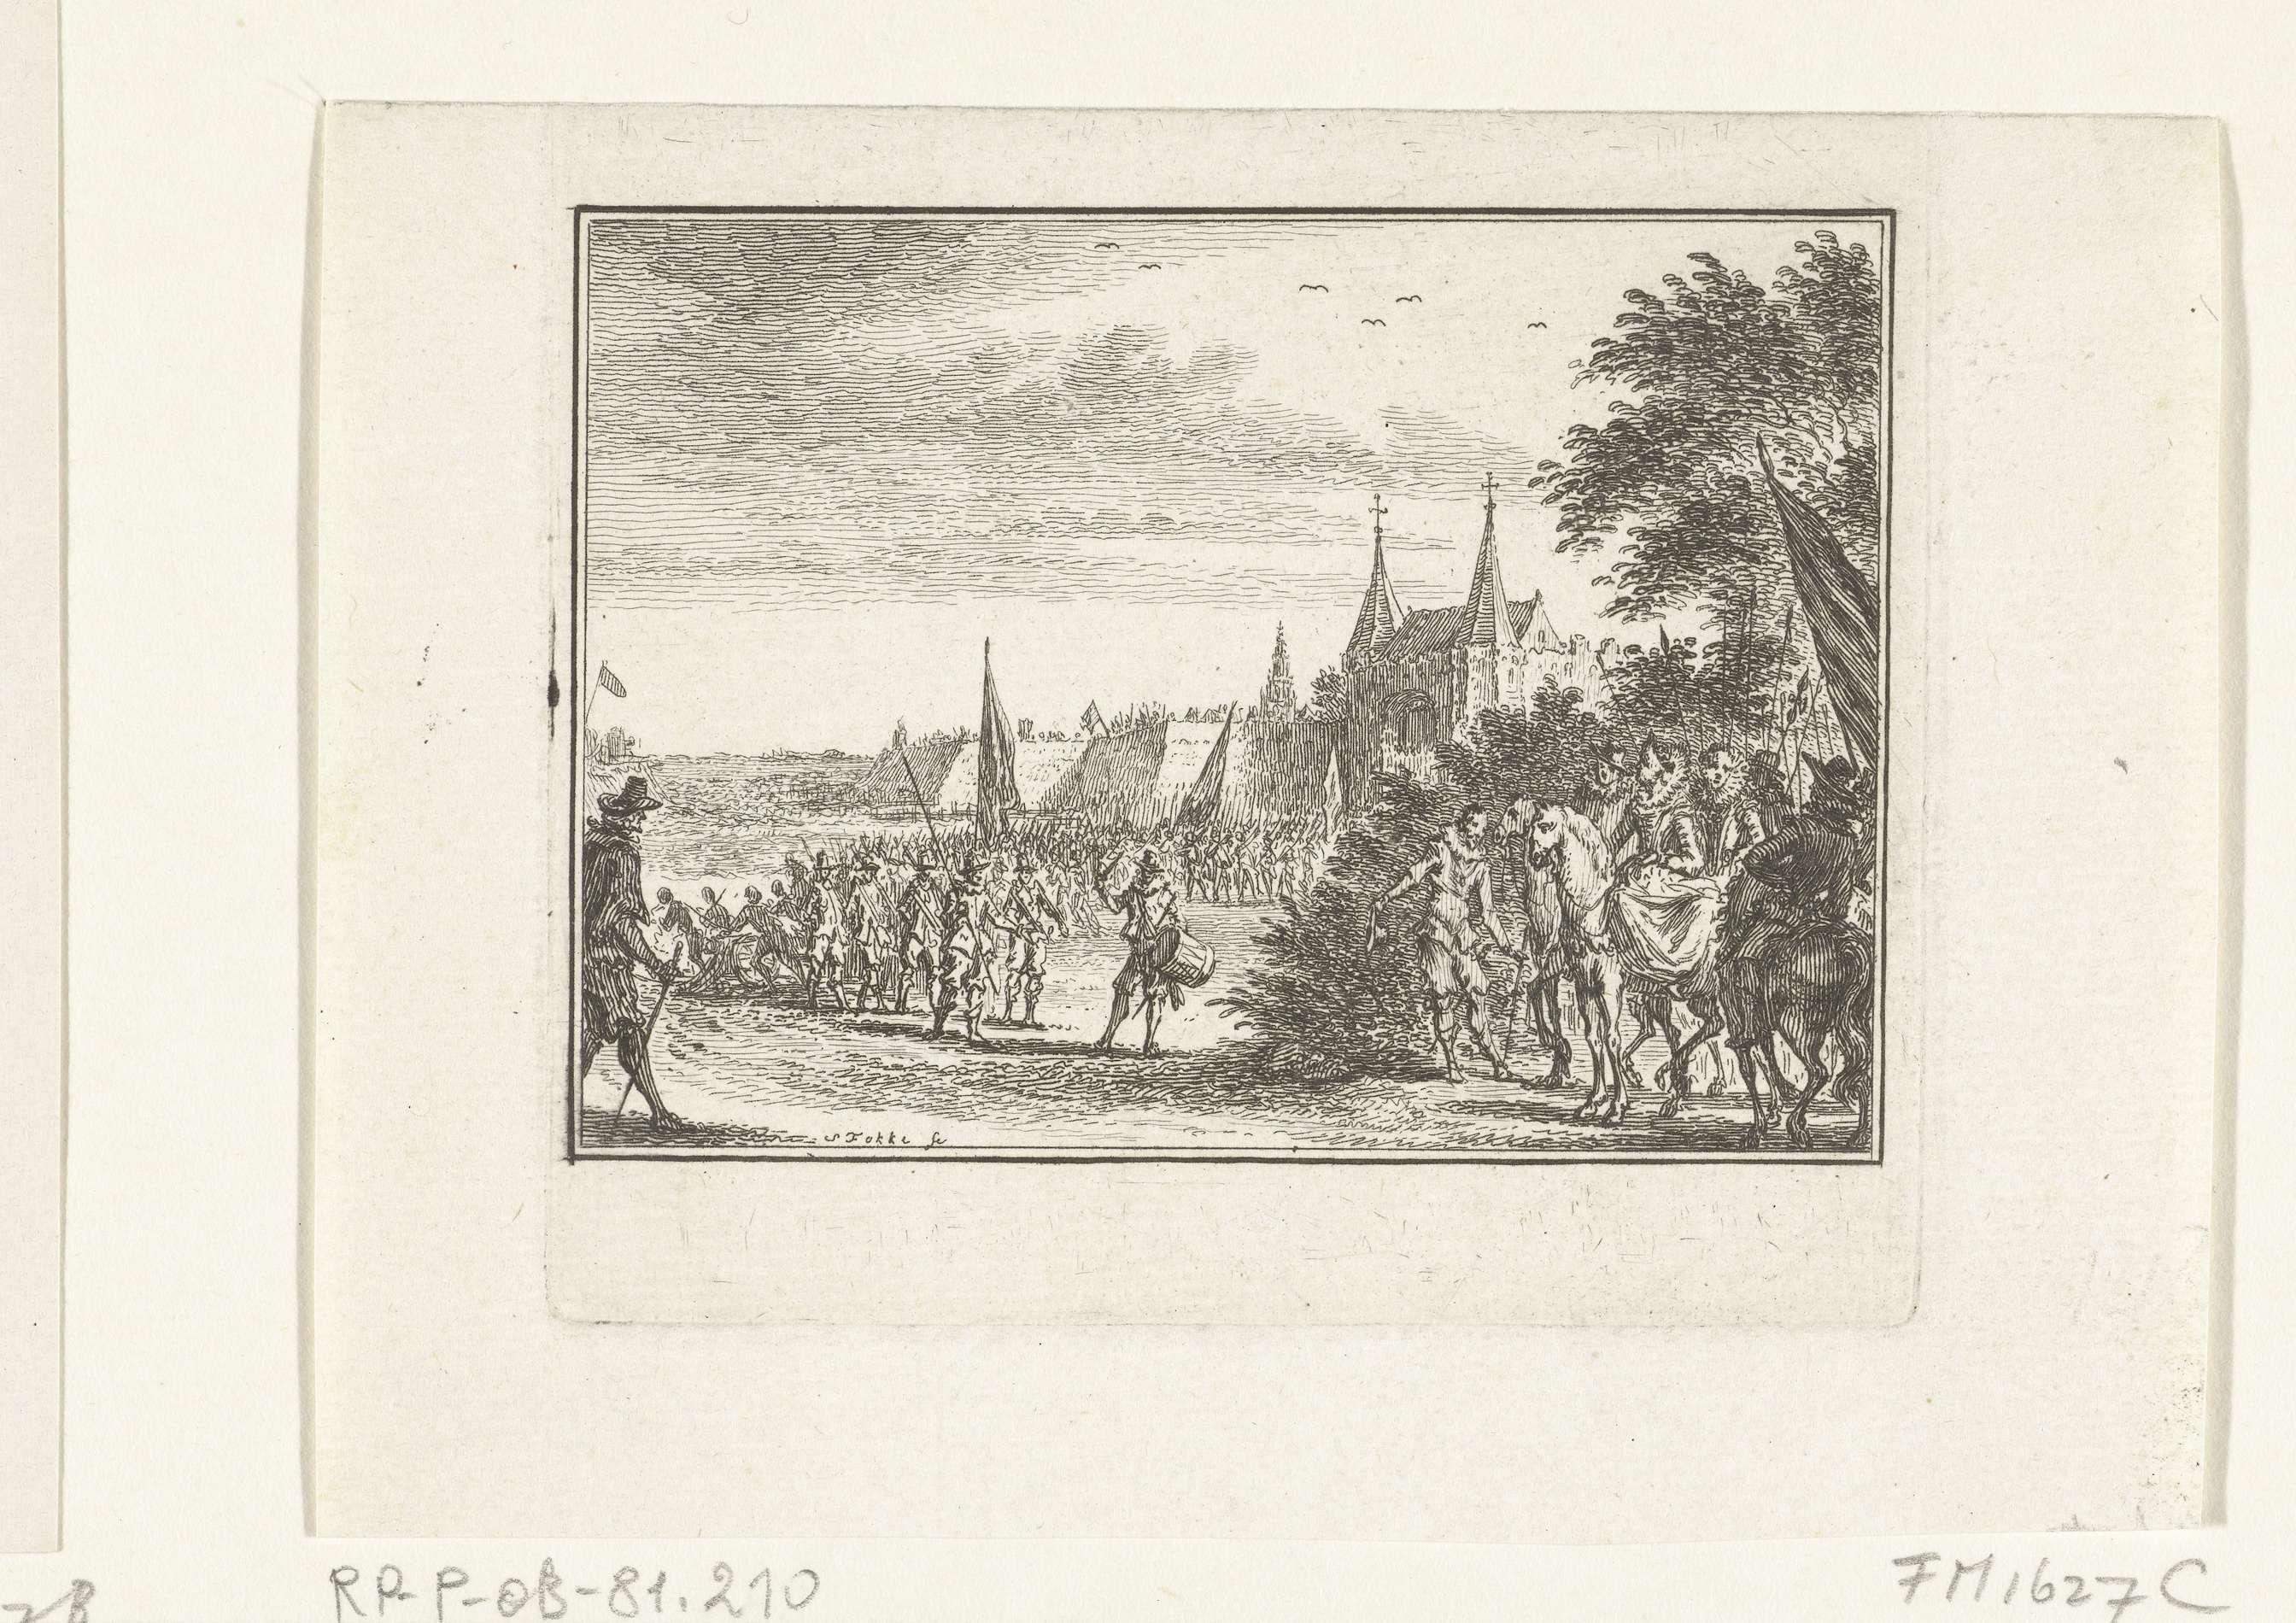 Simon Fokke | Spaanse troepen verlaten Den Bosch, 1629, Simon Fokke, 1782 - 1784 | De Spaanse troepen verlaten Den Bosch, na de overgave van de stad, 17 september 1629.